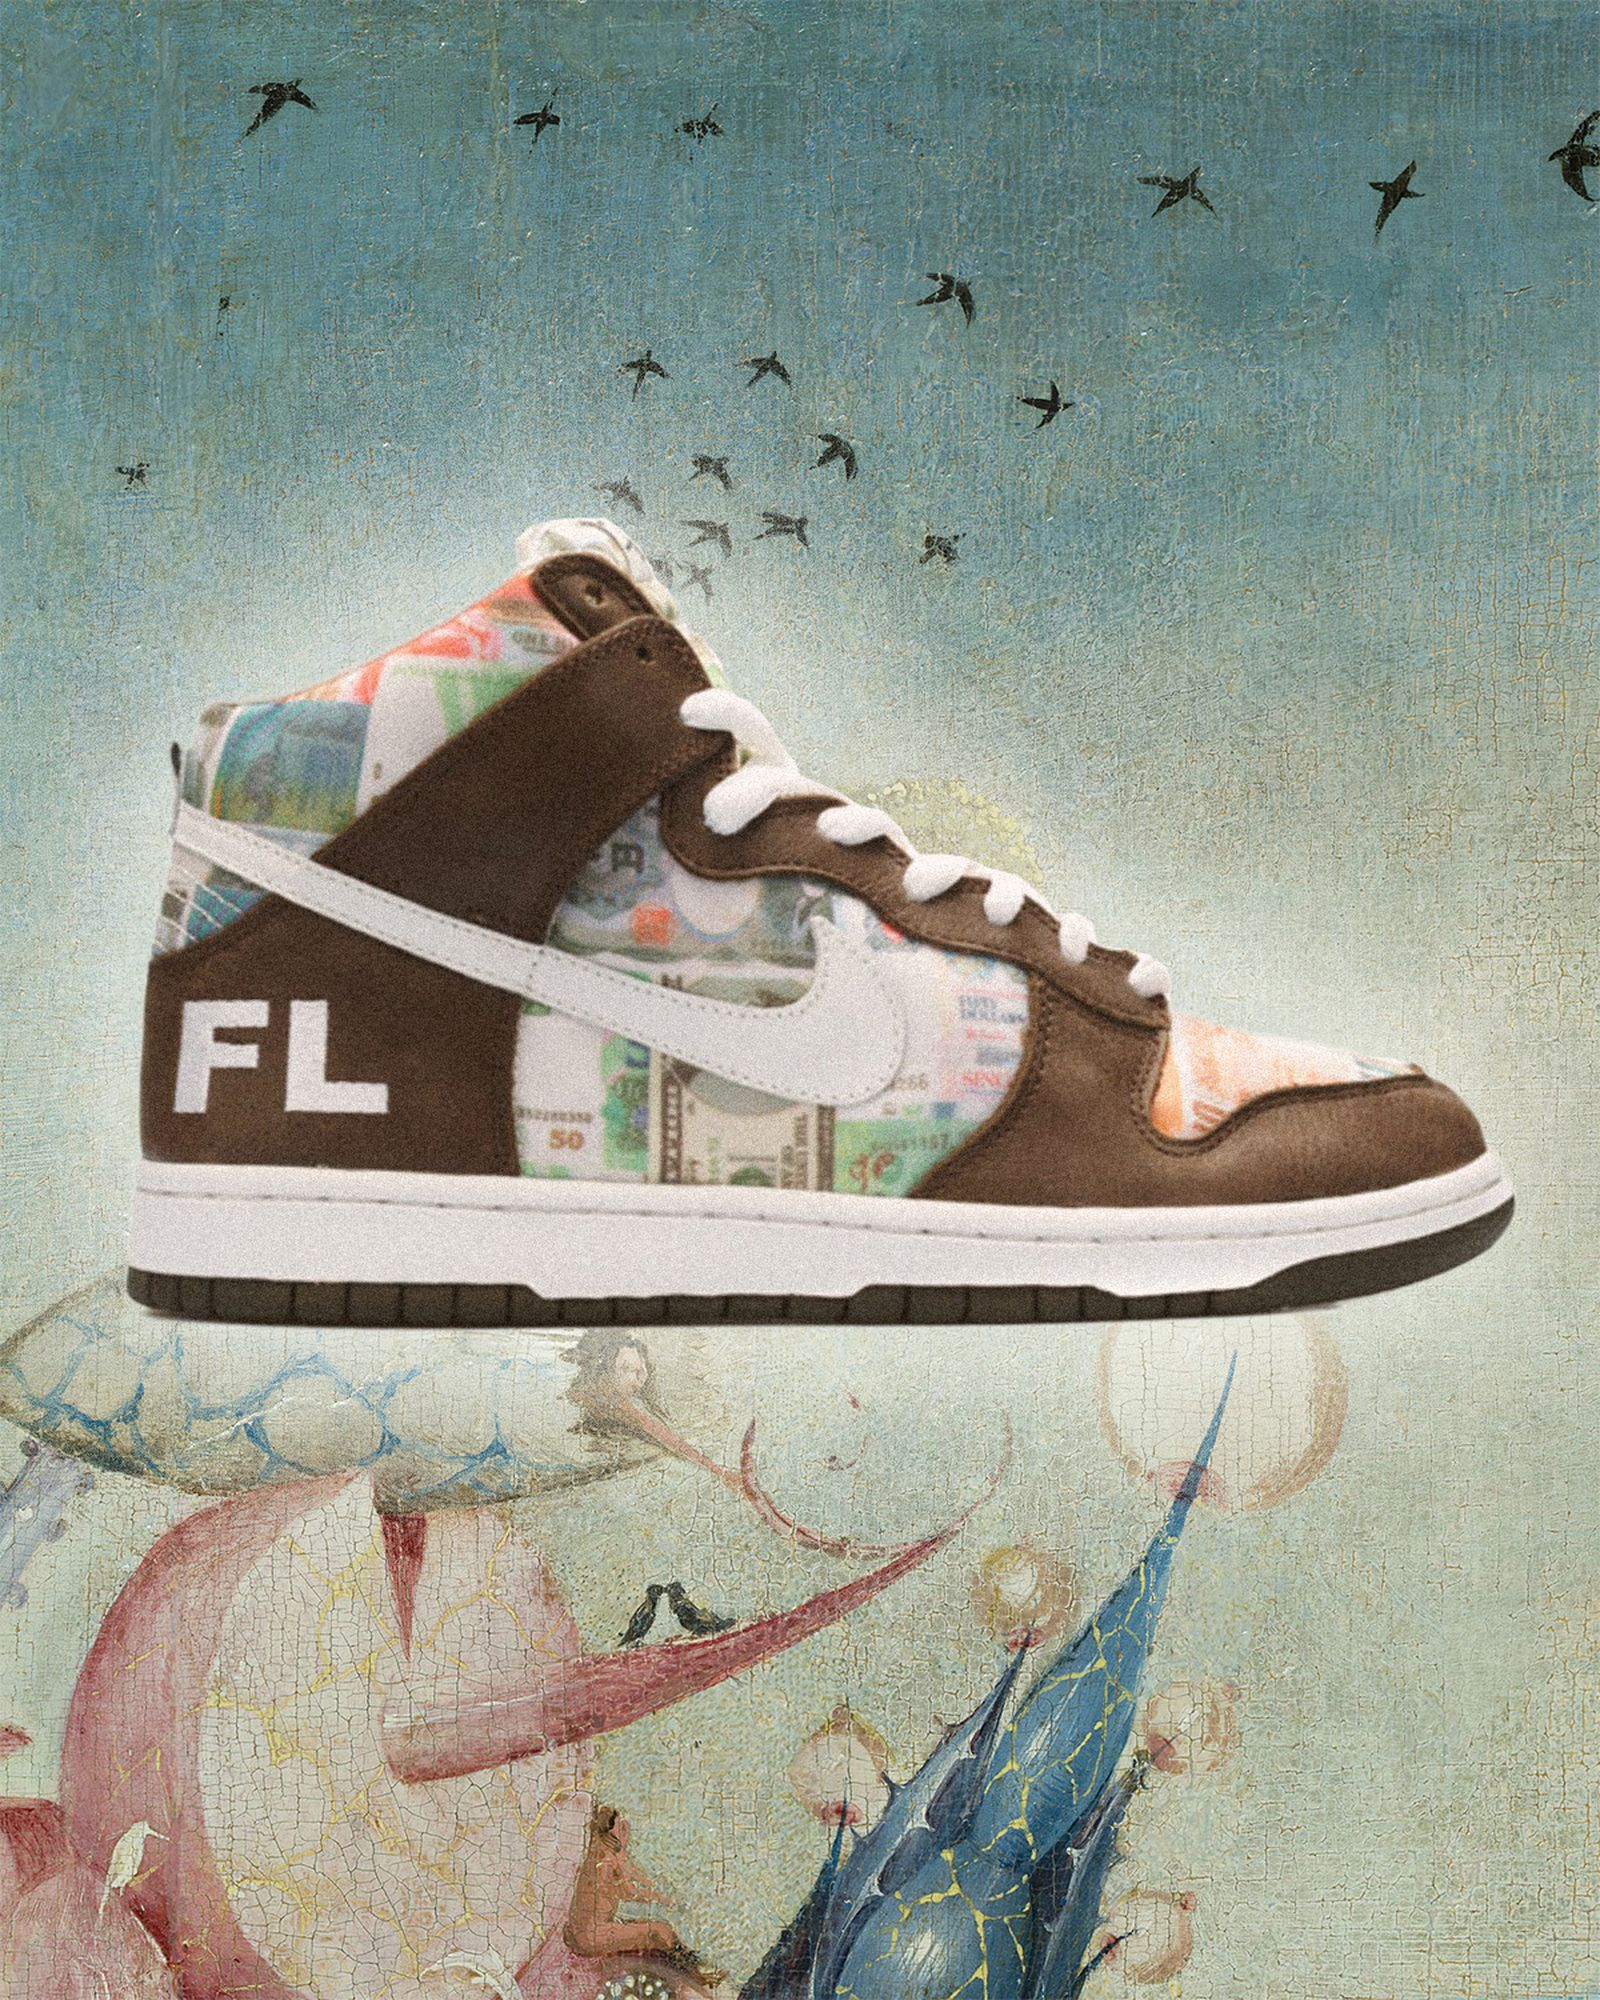 05-Nike-Dunk-High-Pro-SB-FLOM